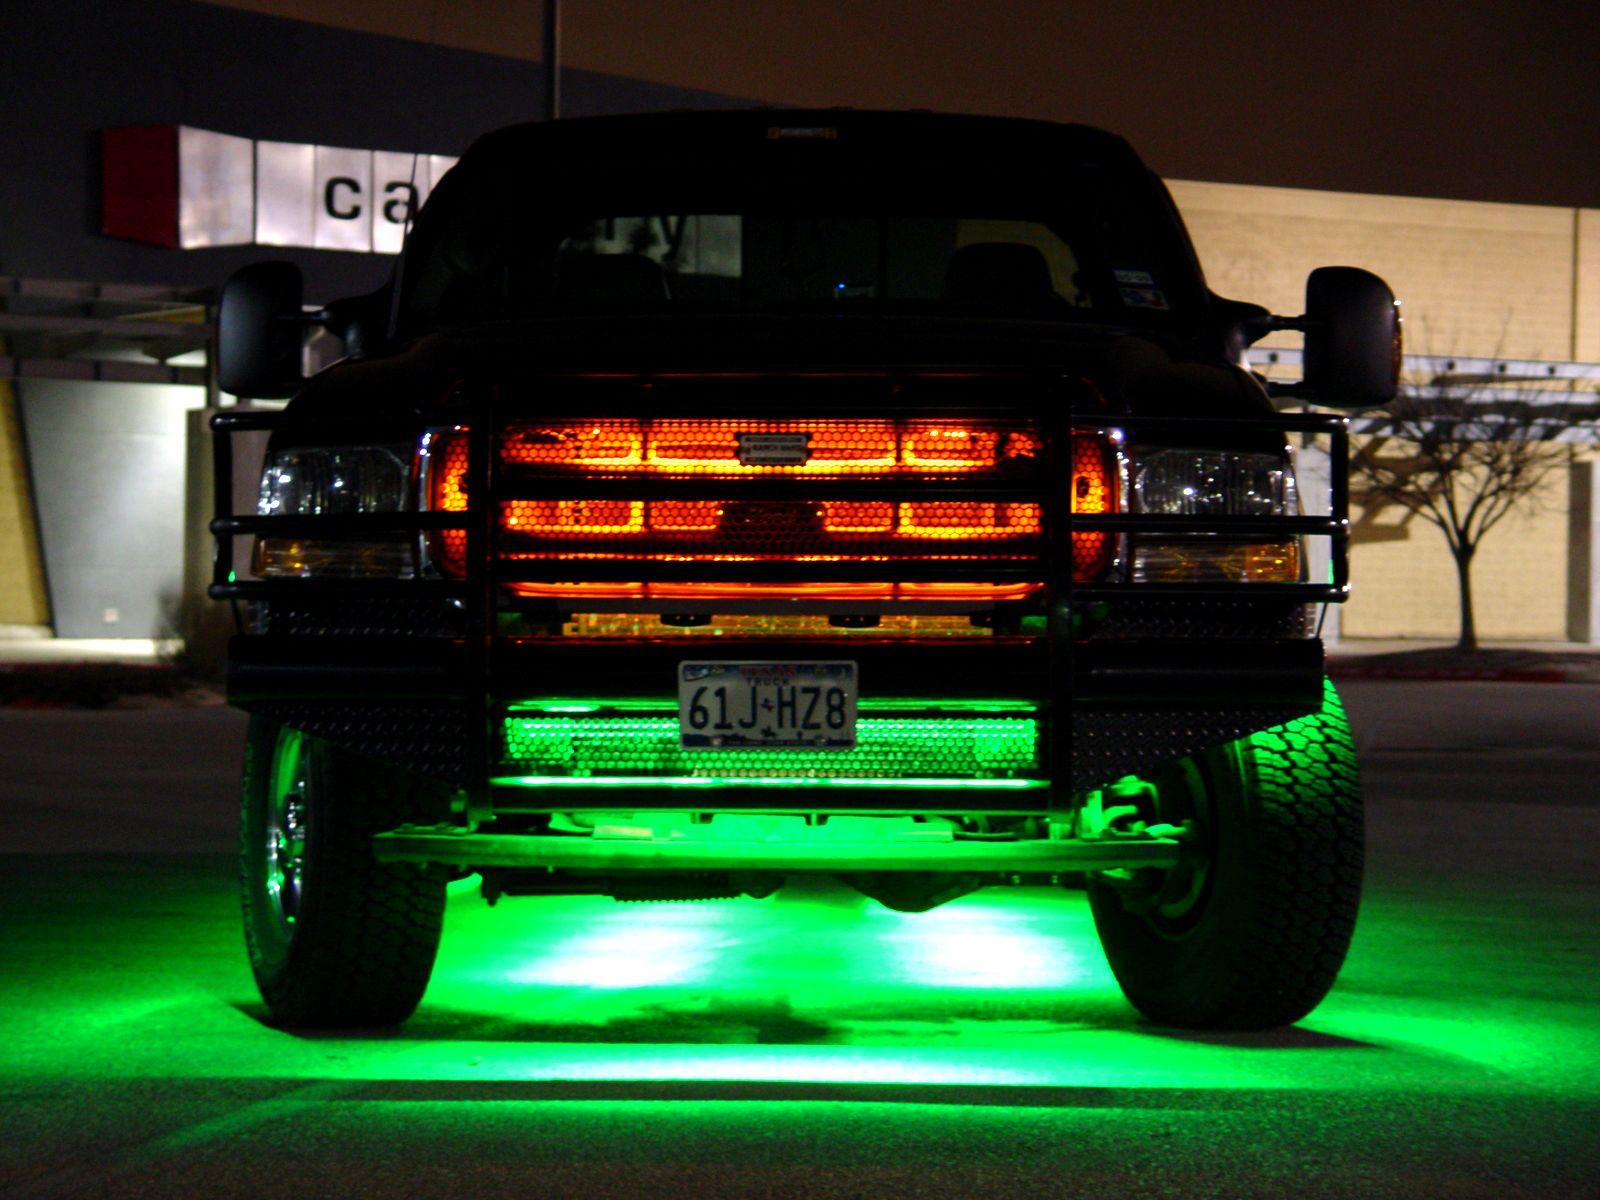 Ultimate Led Truck Grille Kit Led Truck Lighting Truck Grilles Led Lights For Trucks Truck Lights